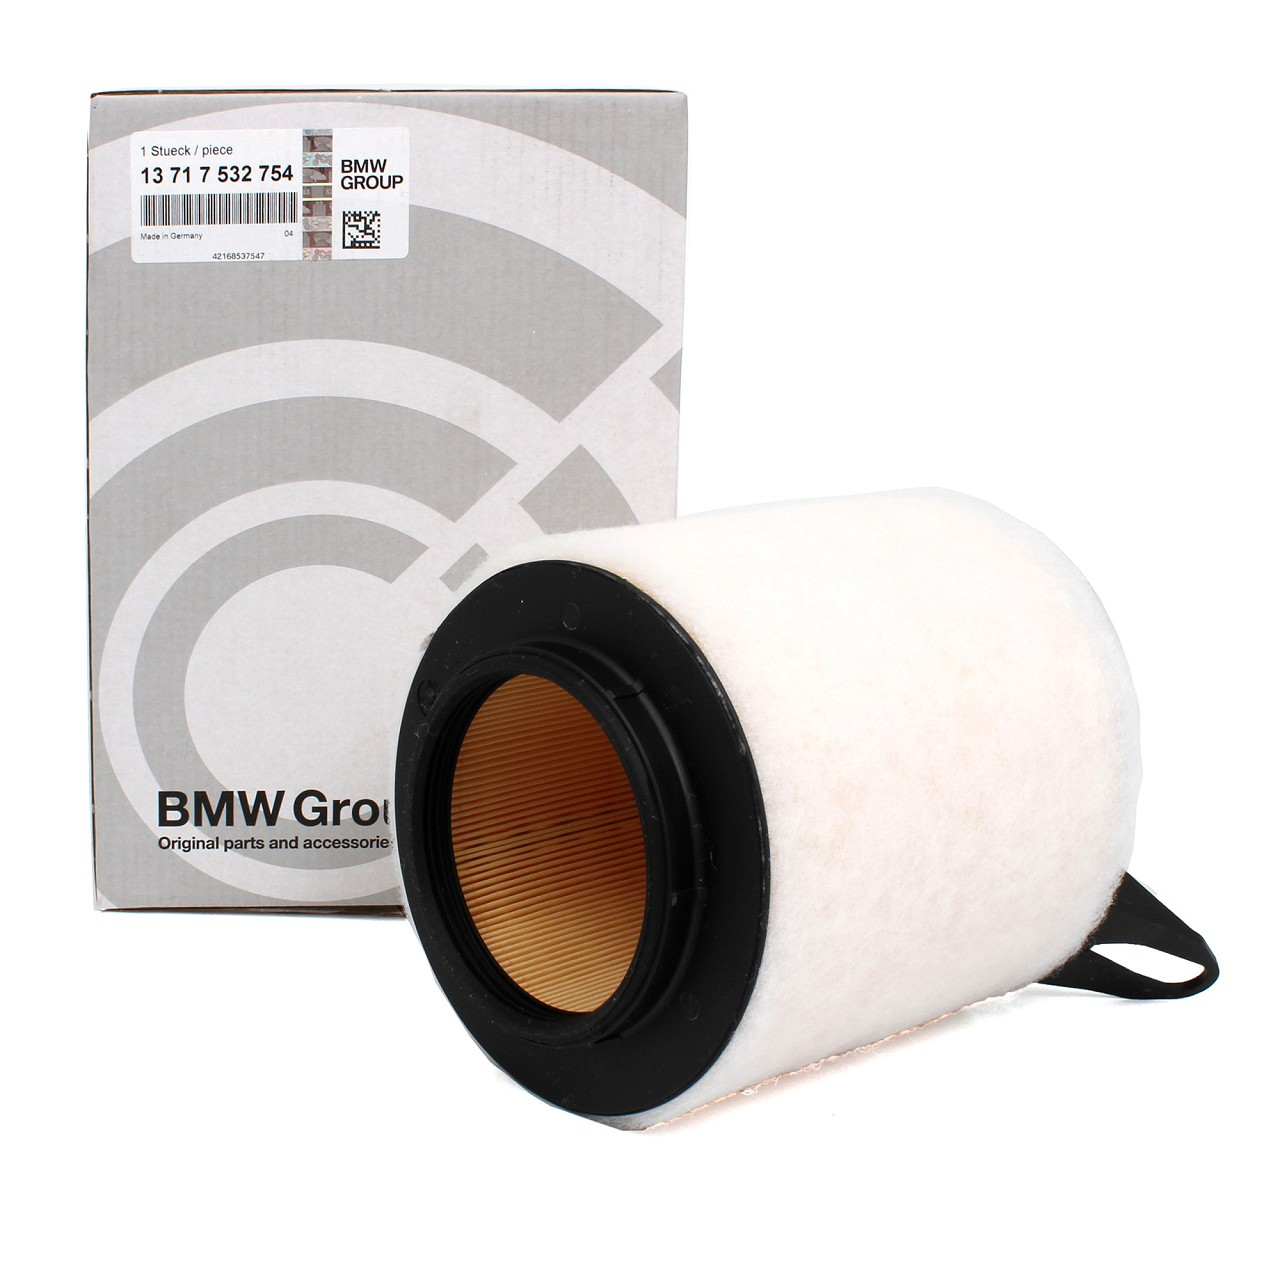 ORIGINAL BMW Luftfilter E81 E87 E88 E82 E90 E93 E92 E91 X1 E84 13717532754